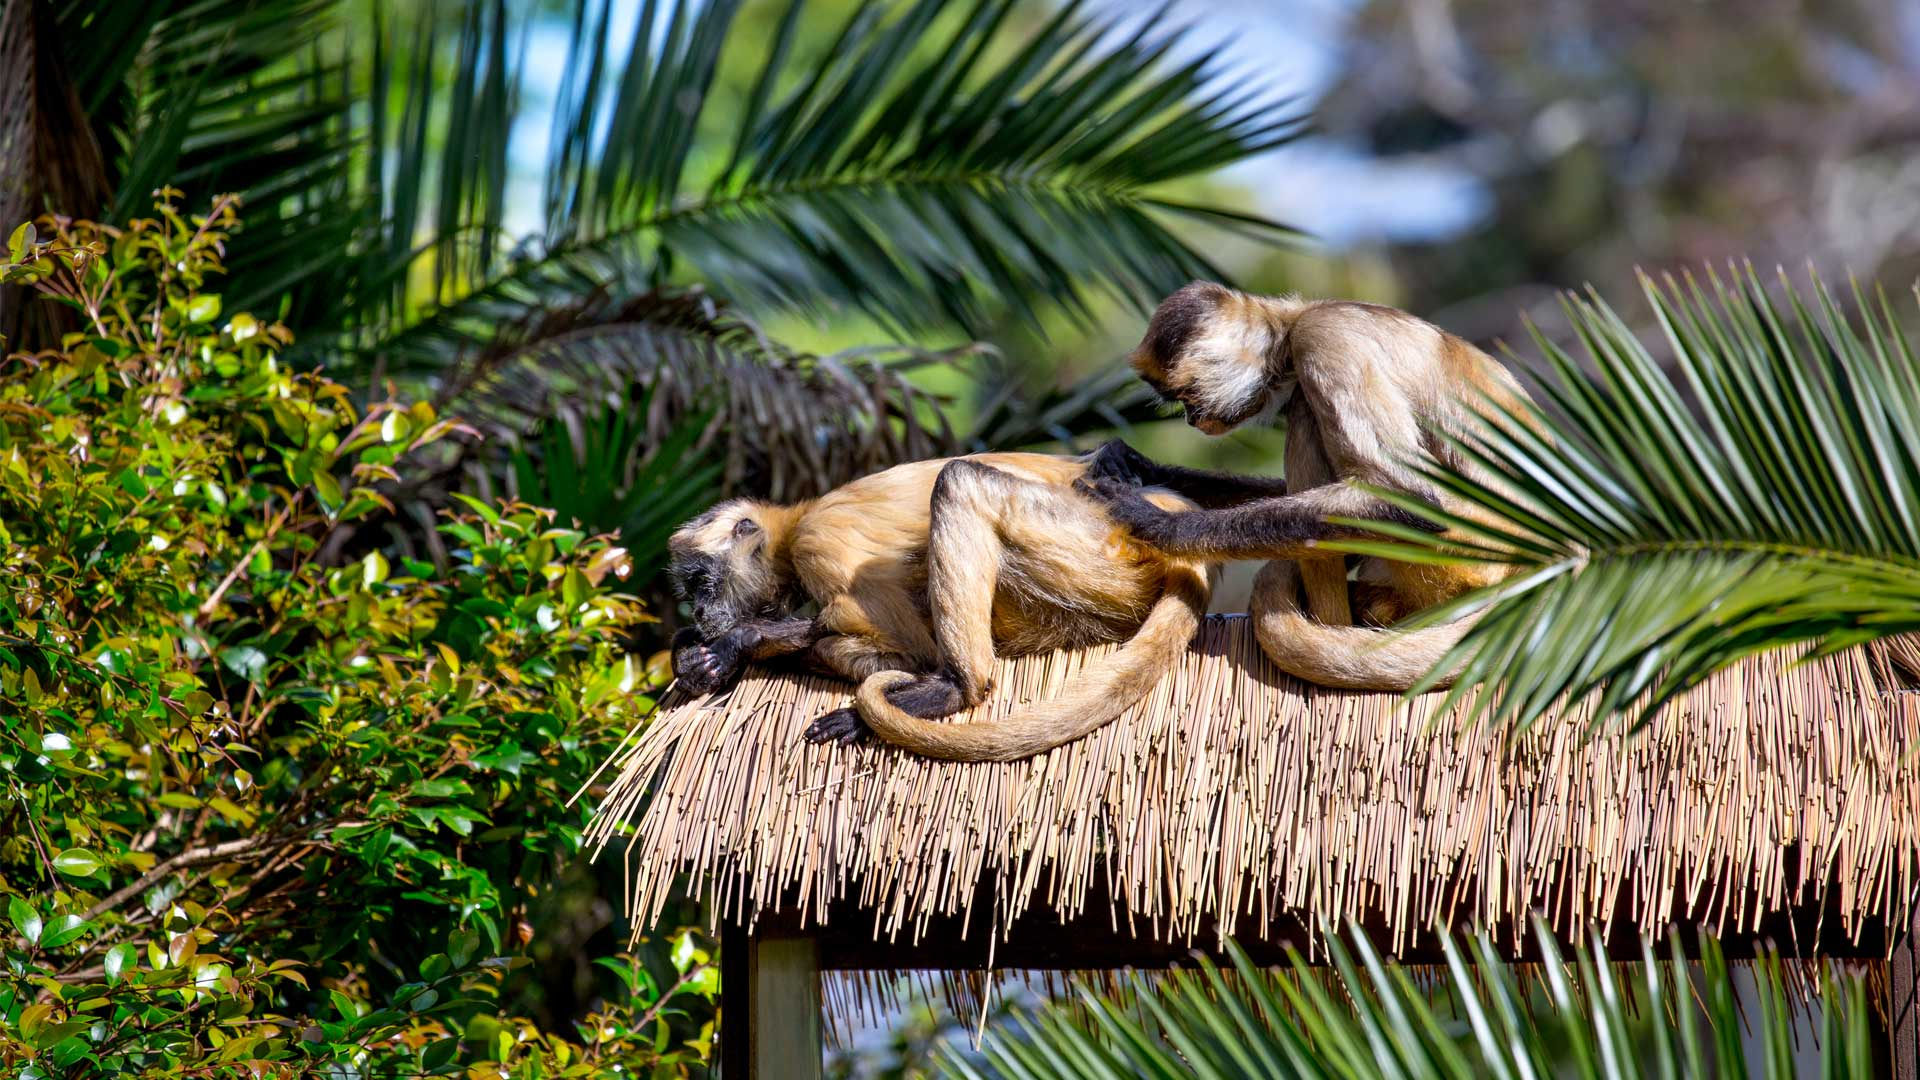 https://rfacdn.nz/zoo/assets/media/spider-monkey-gallery-4.jpg